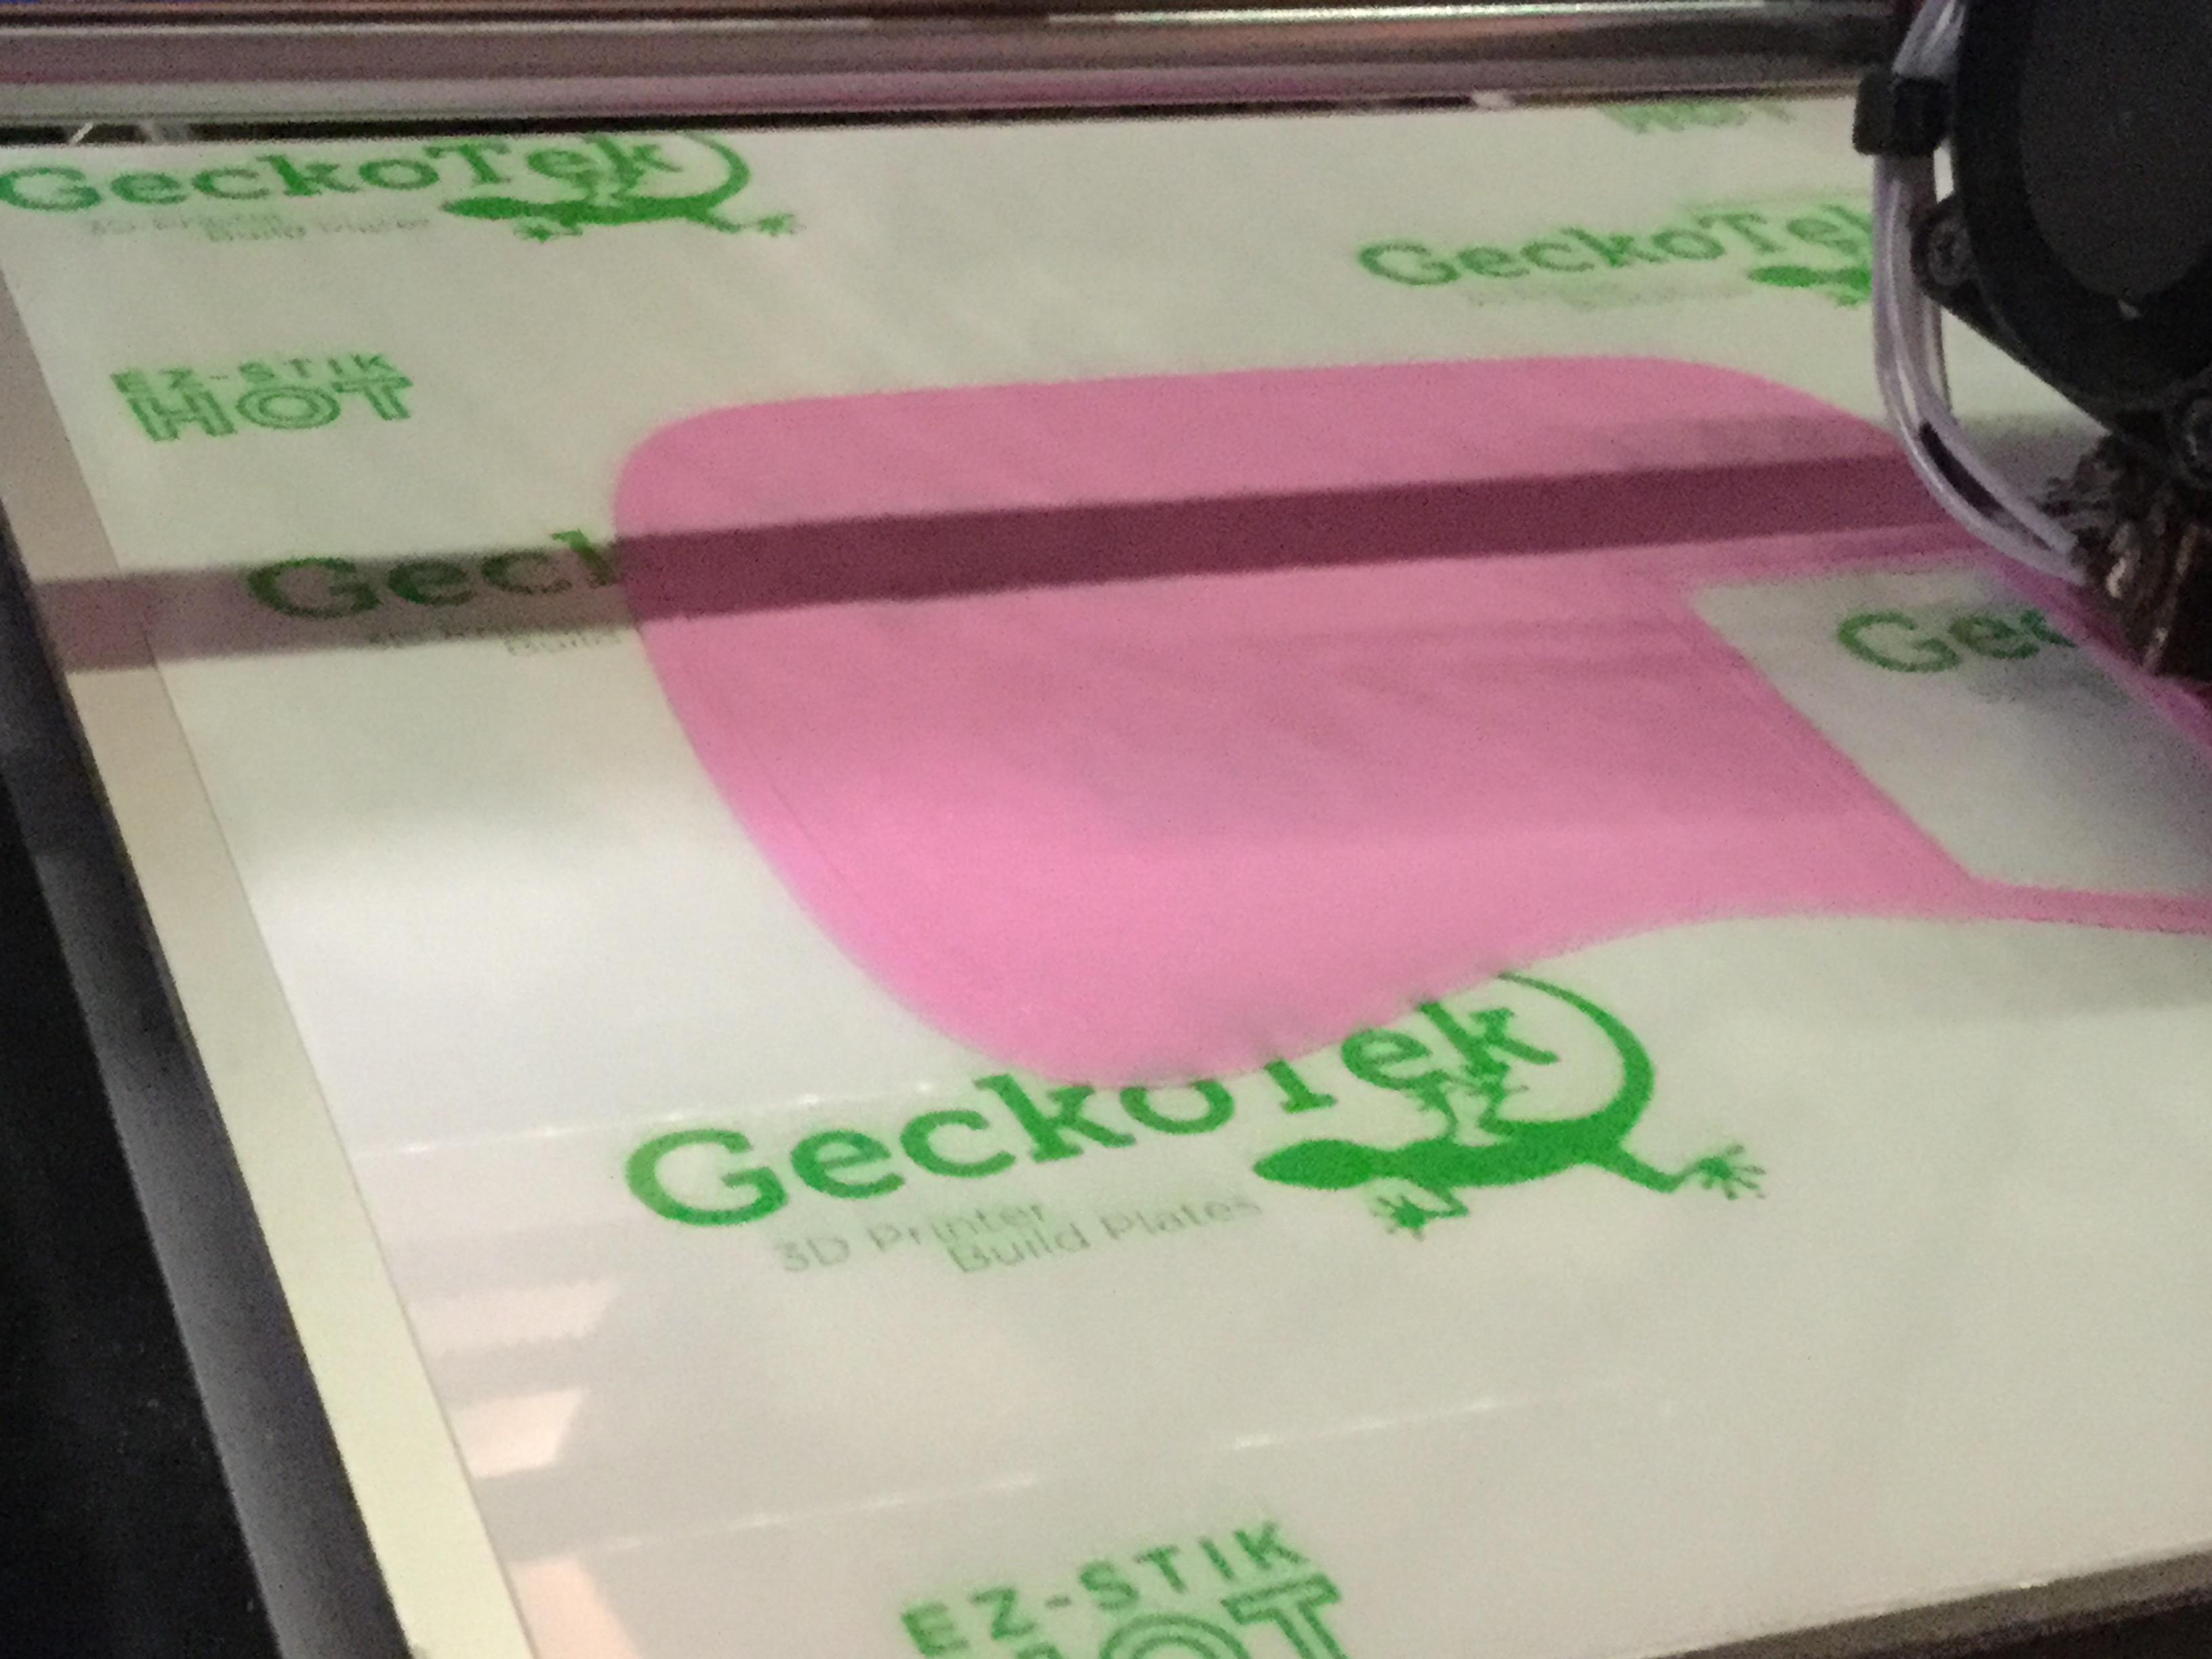 GeckoTek